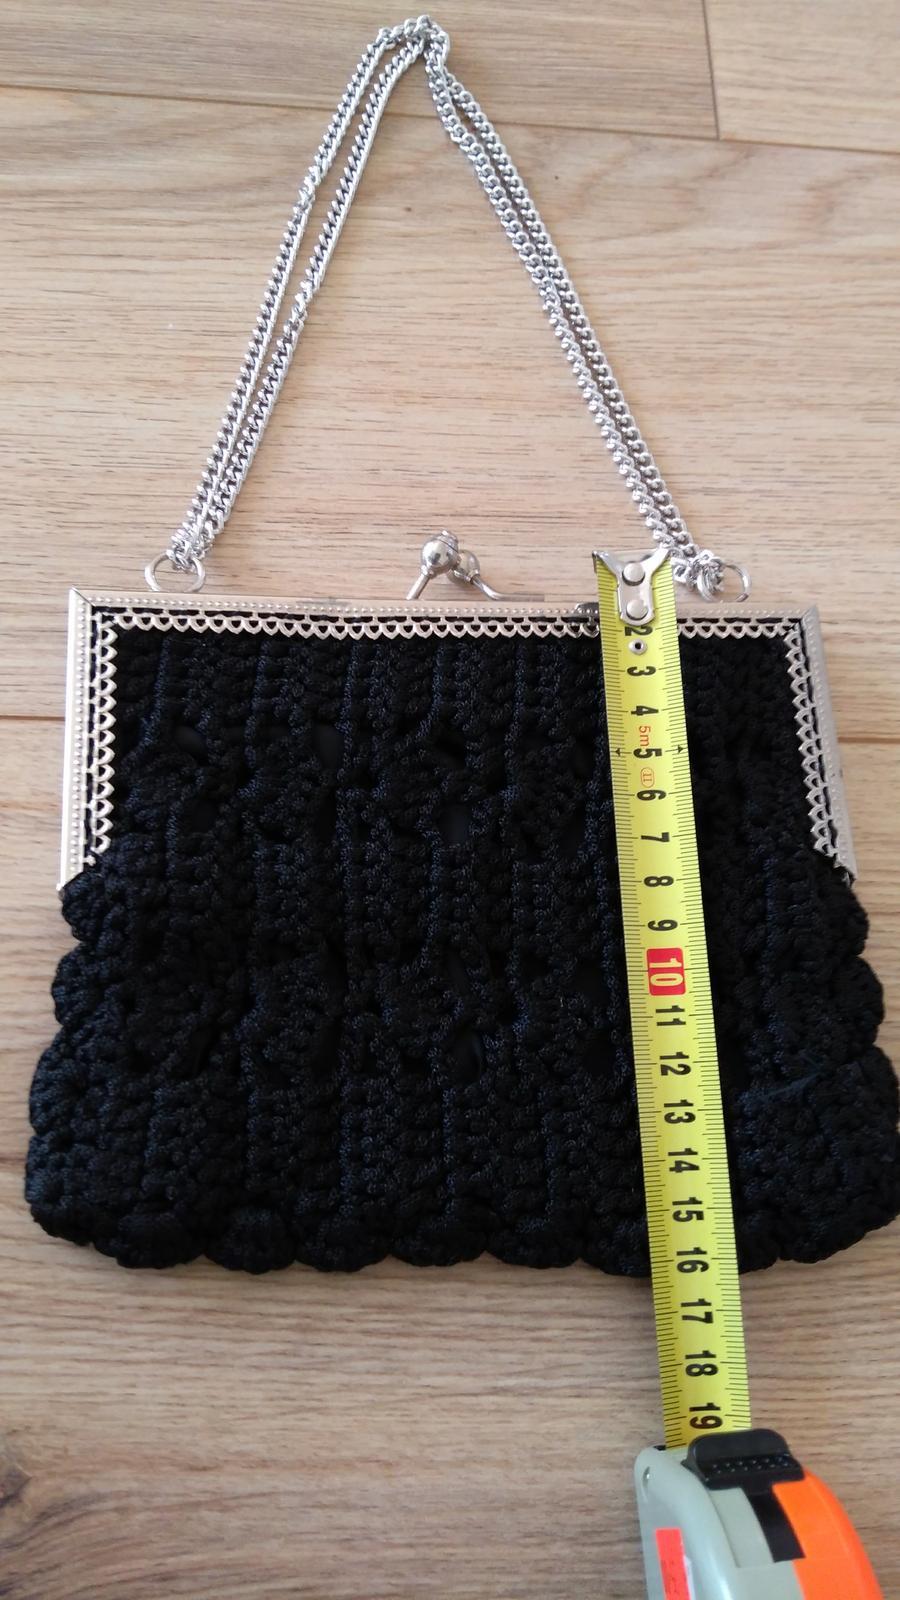 Čierna kabelka - Obrázok č. 3